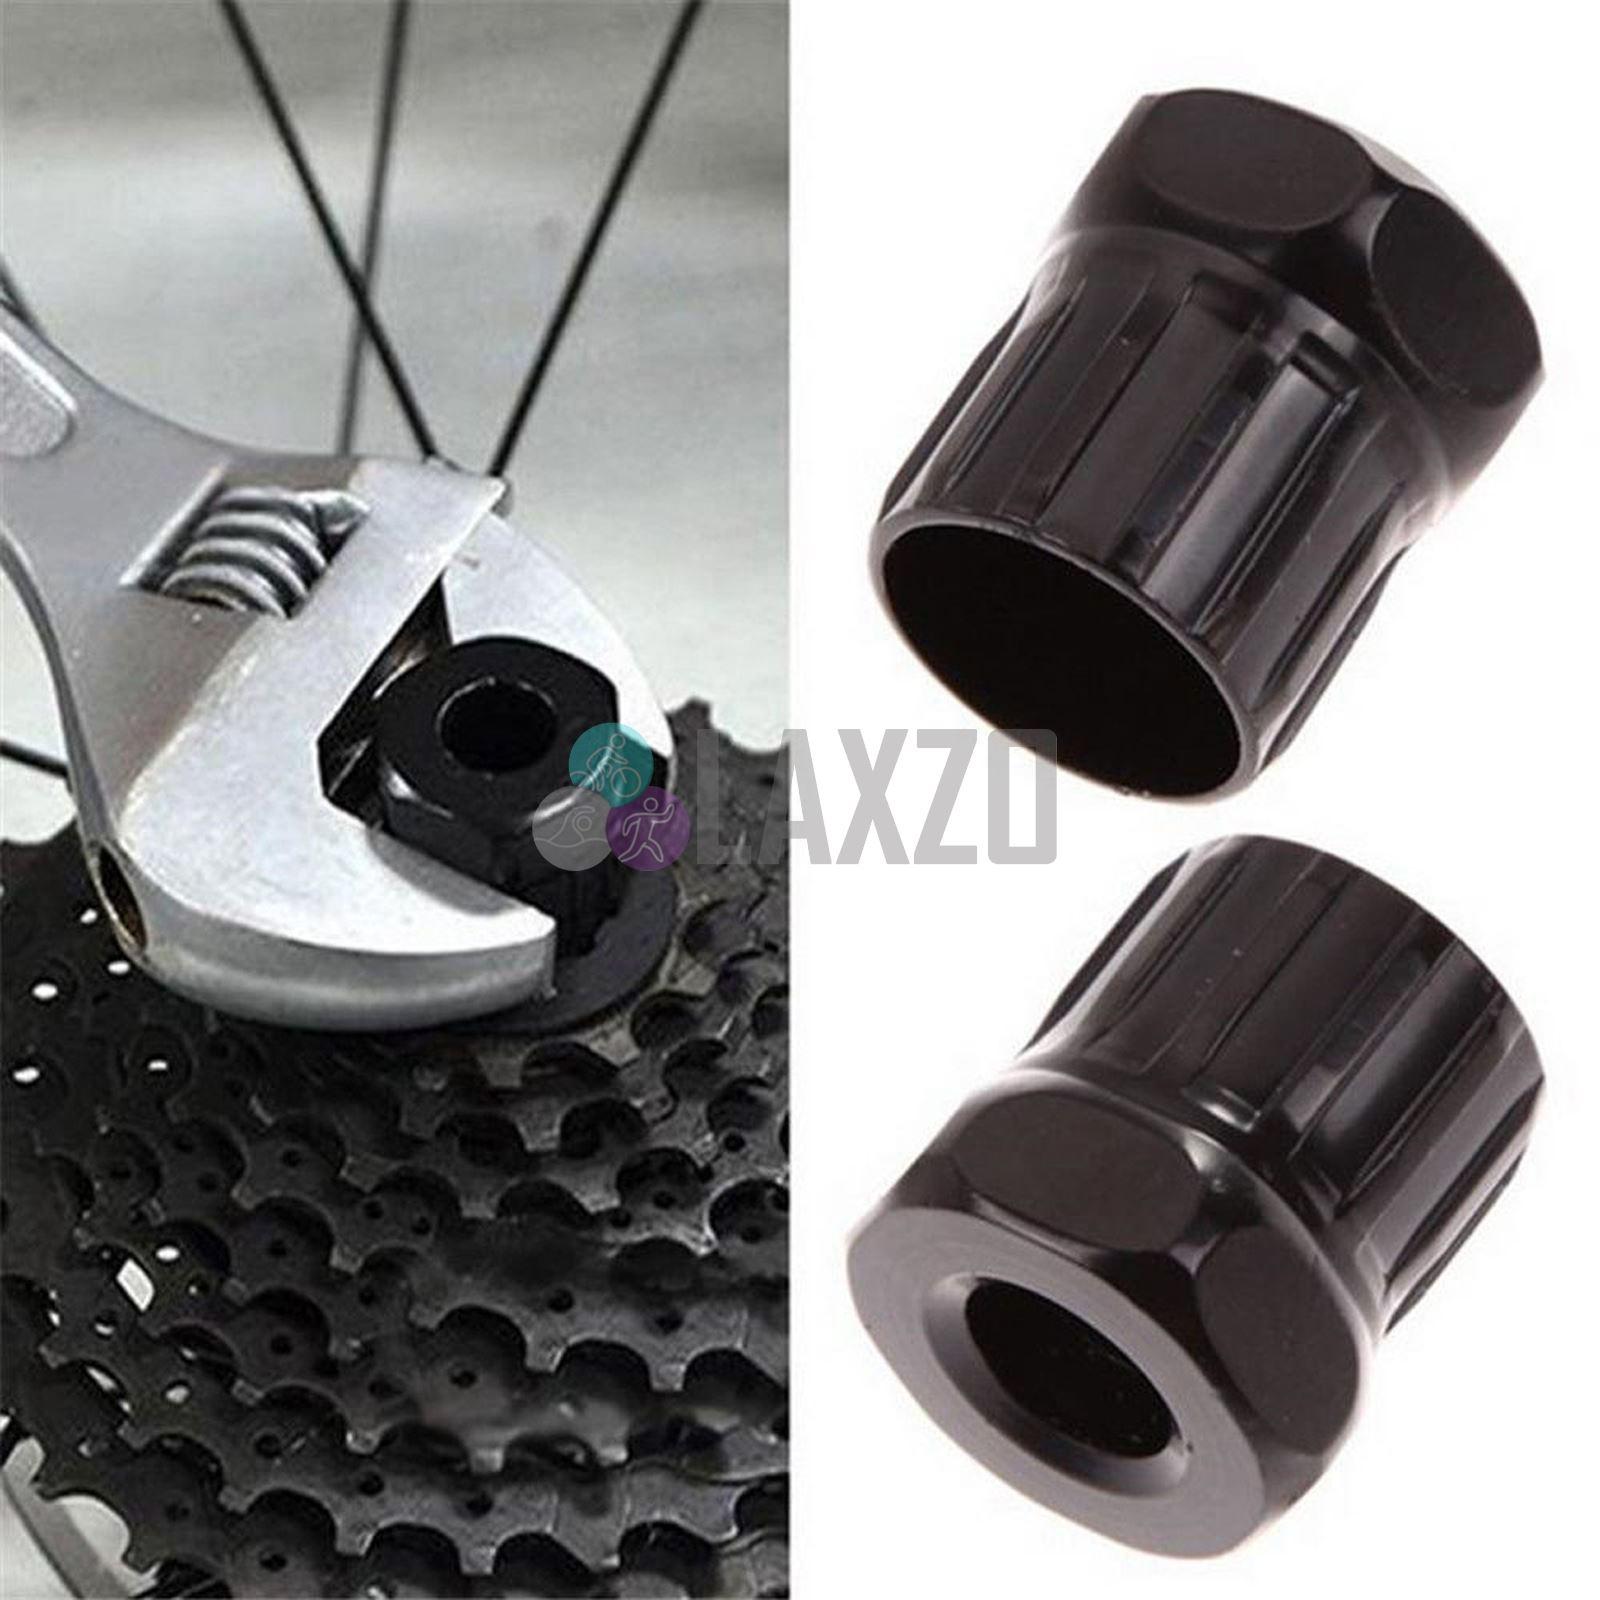 Cycle repair tool 1x Bike rear cassette cog remover Shimano freewheel socket A